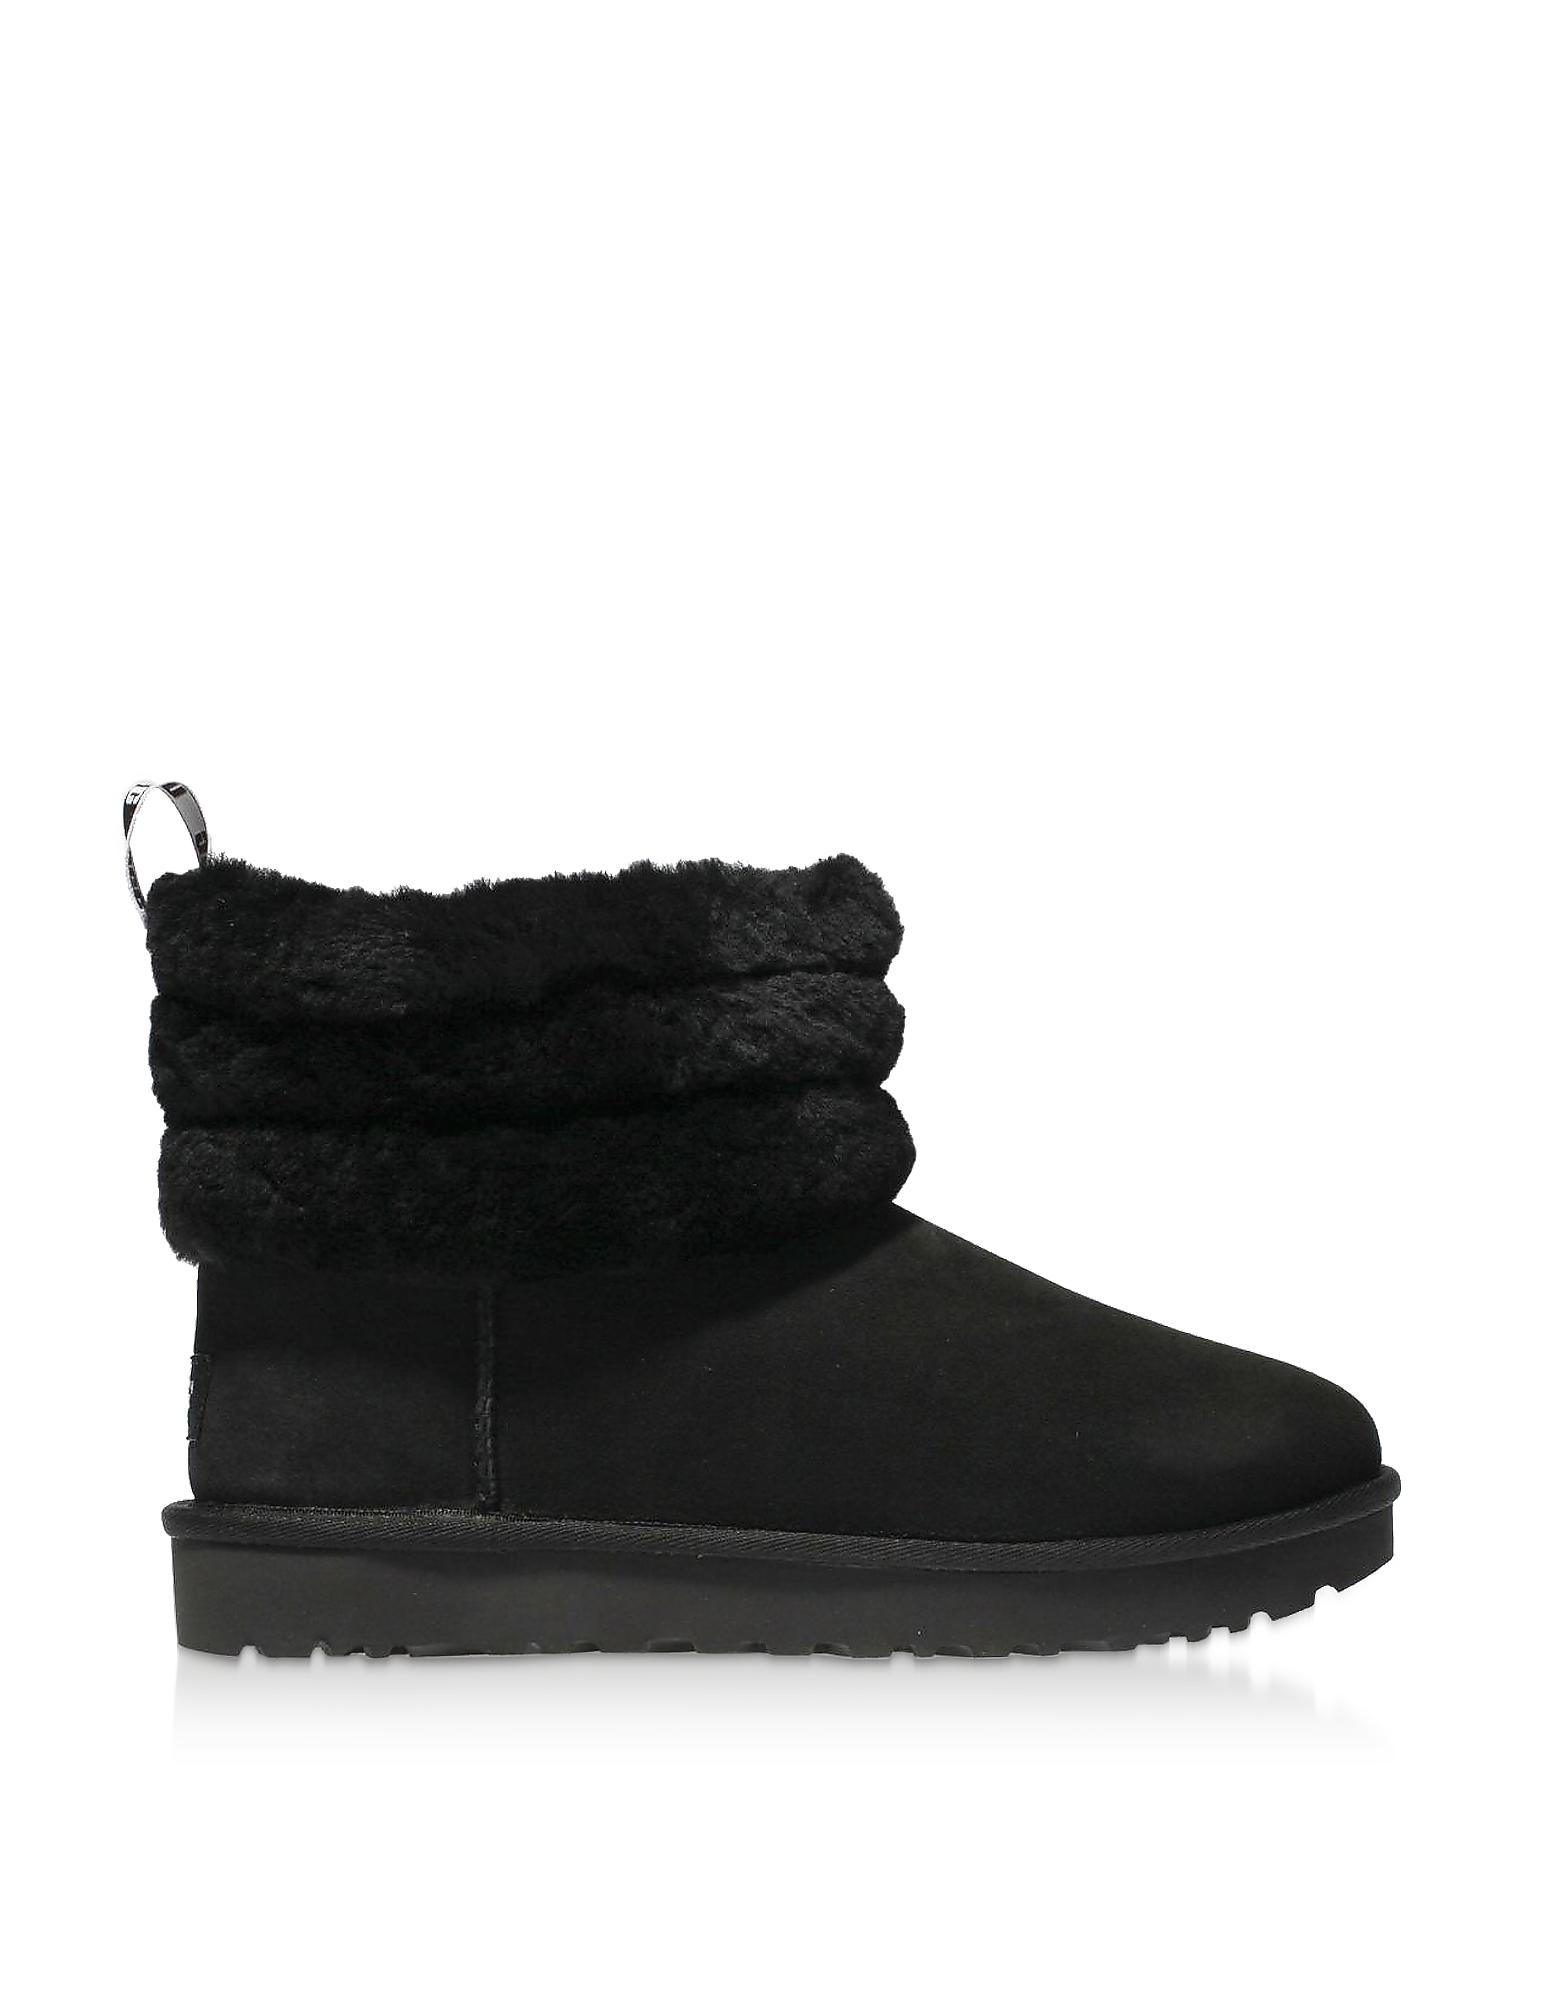 UGG Designer Shoes, Black Fluff Mini Quilted Boots